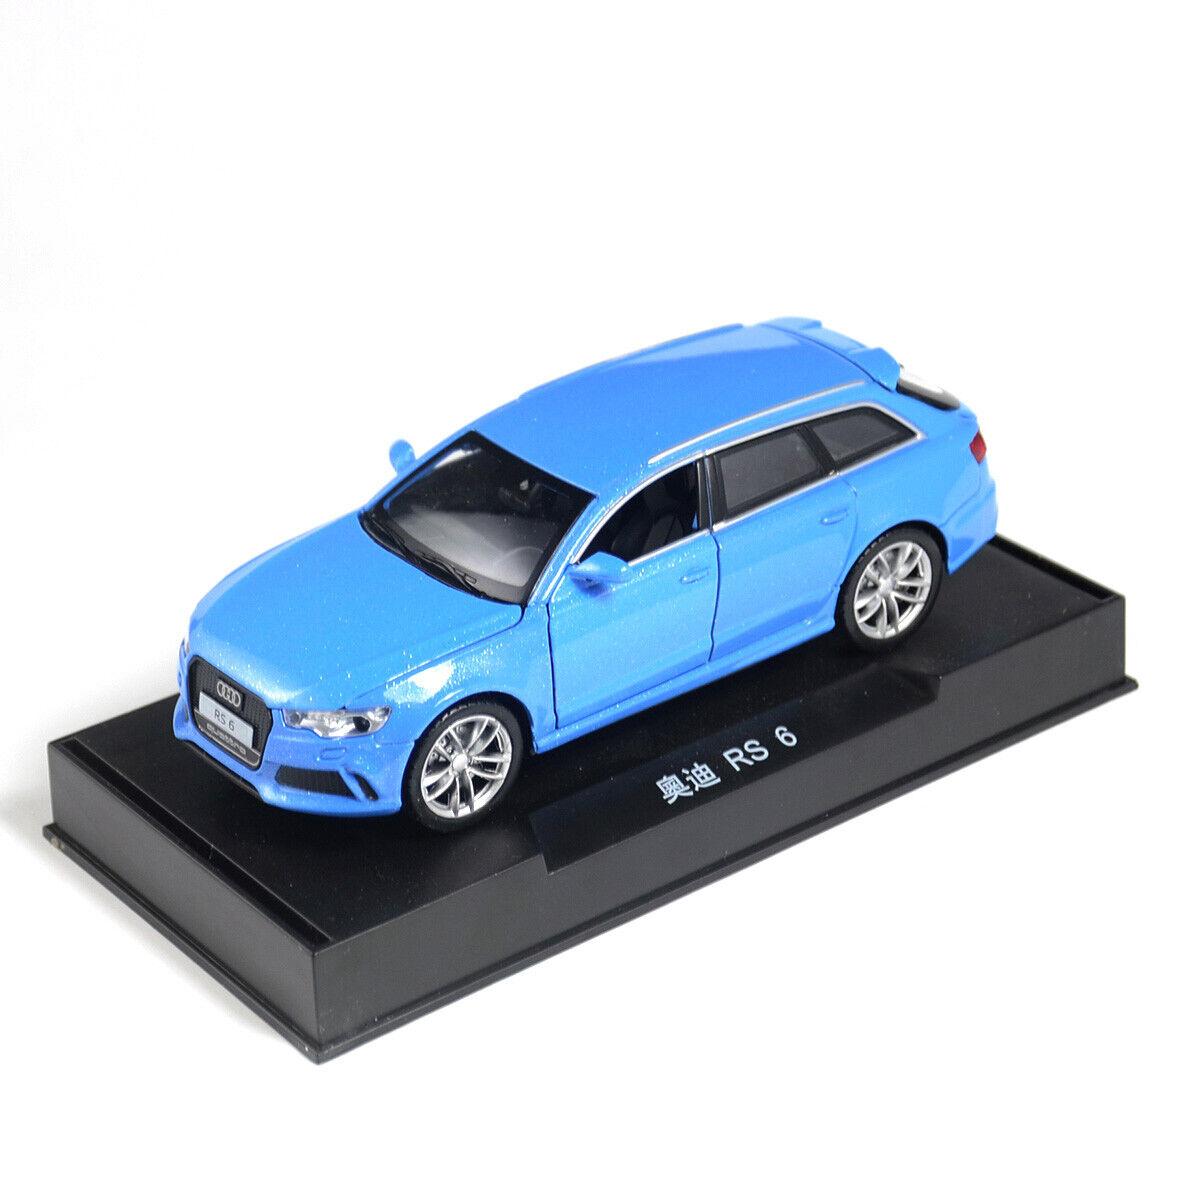 1 32 Audi Rs6 Quattro Metall Die Cast Modellauto Auto Spielzeug Blau